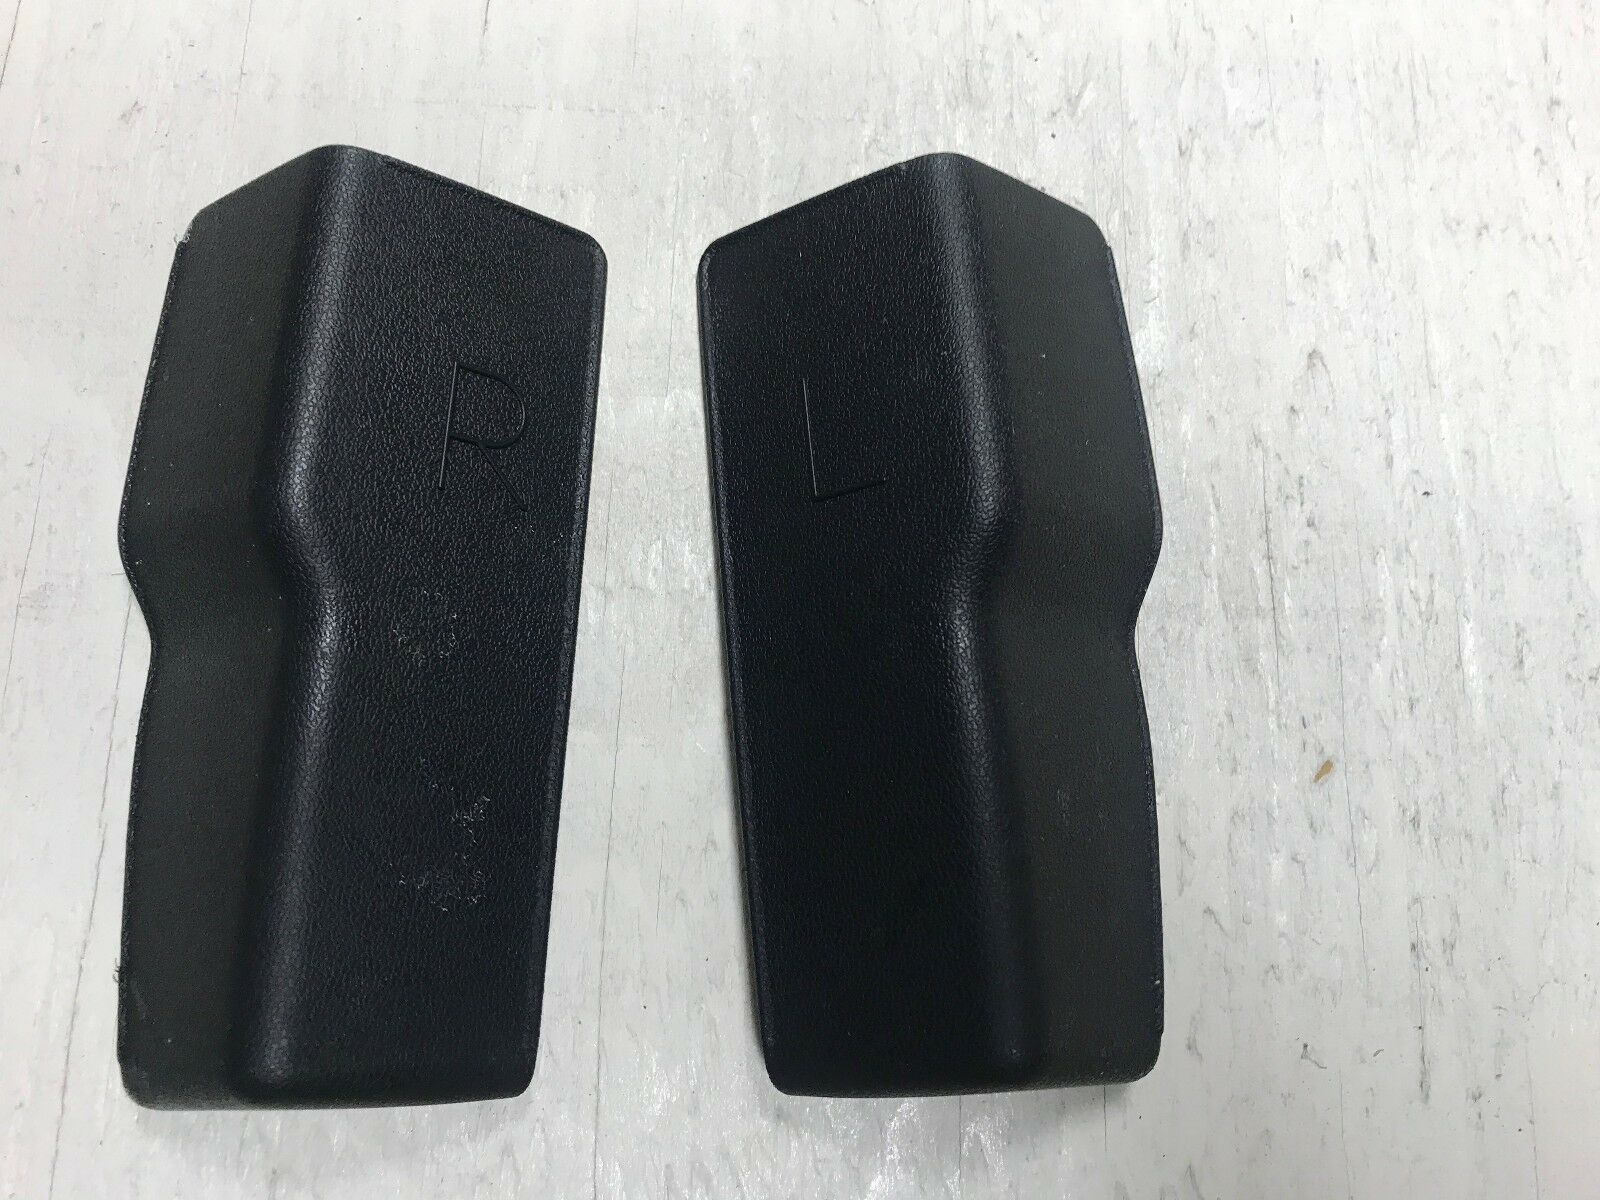 TOYOTA Genuine 71811-08020-B1 Seat Cushion Shield